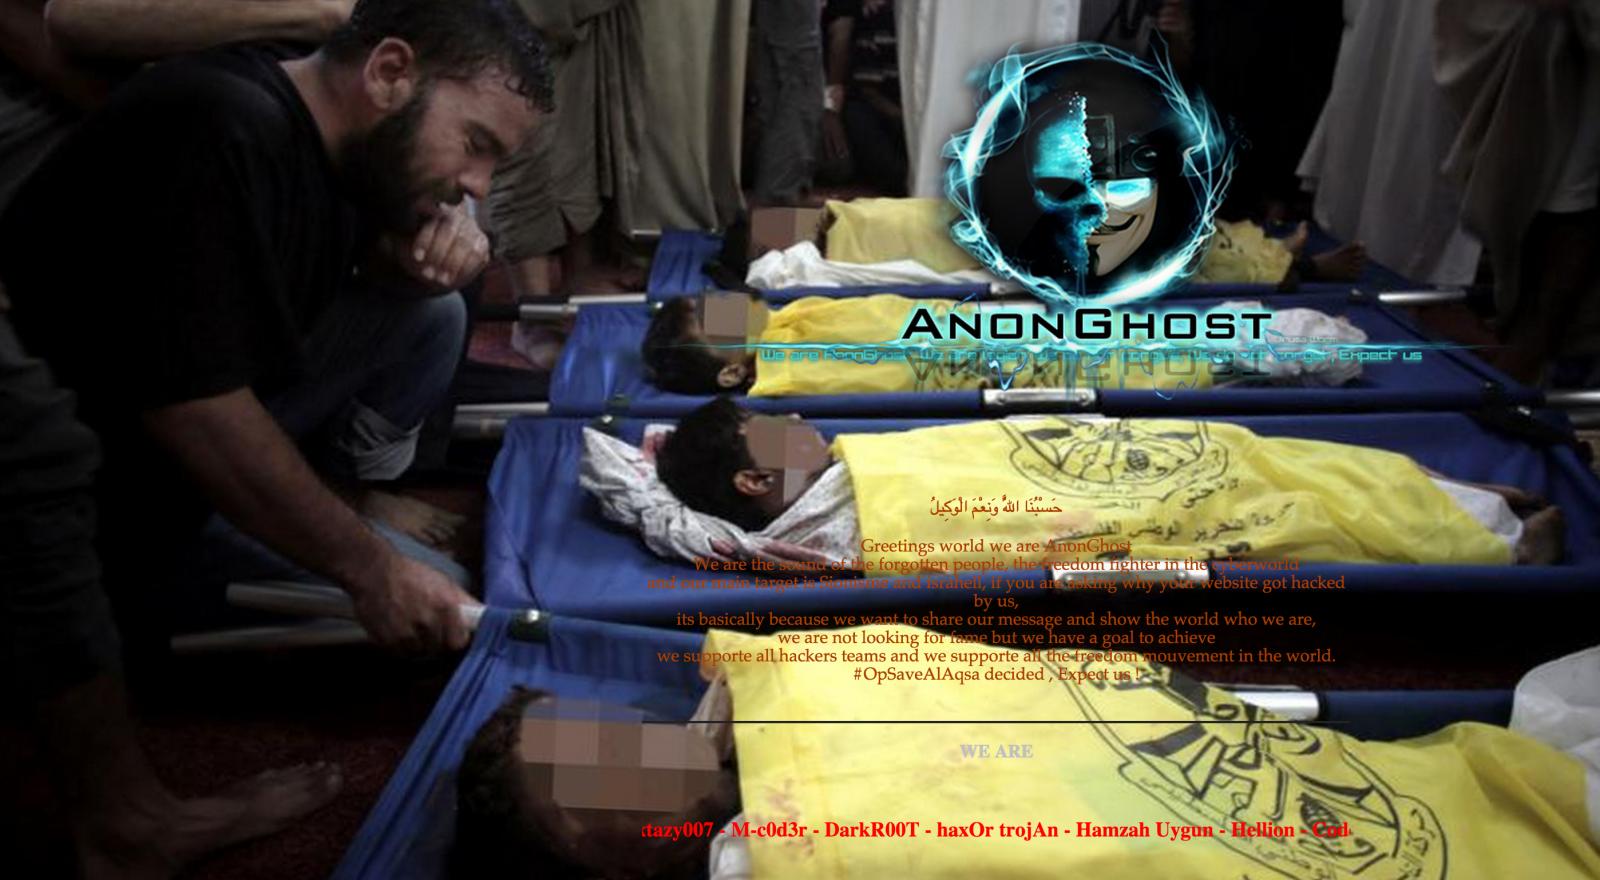 anonghost hackers deface un website following al-asqa mosque tensions